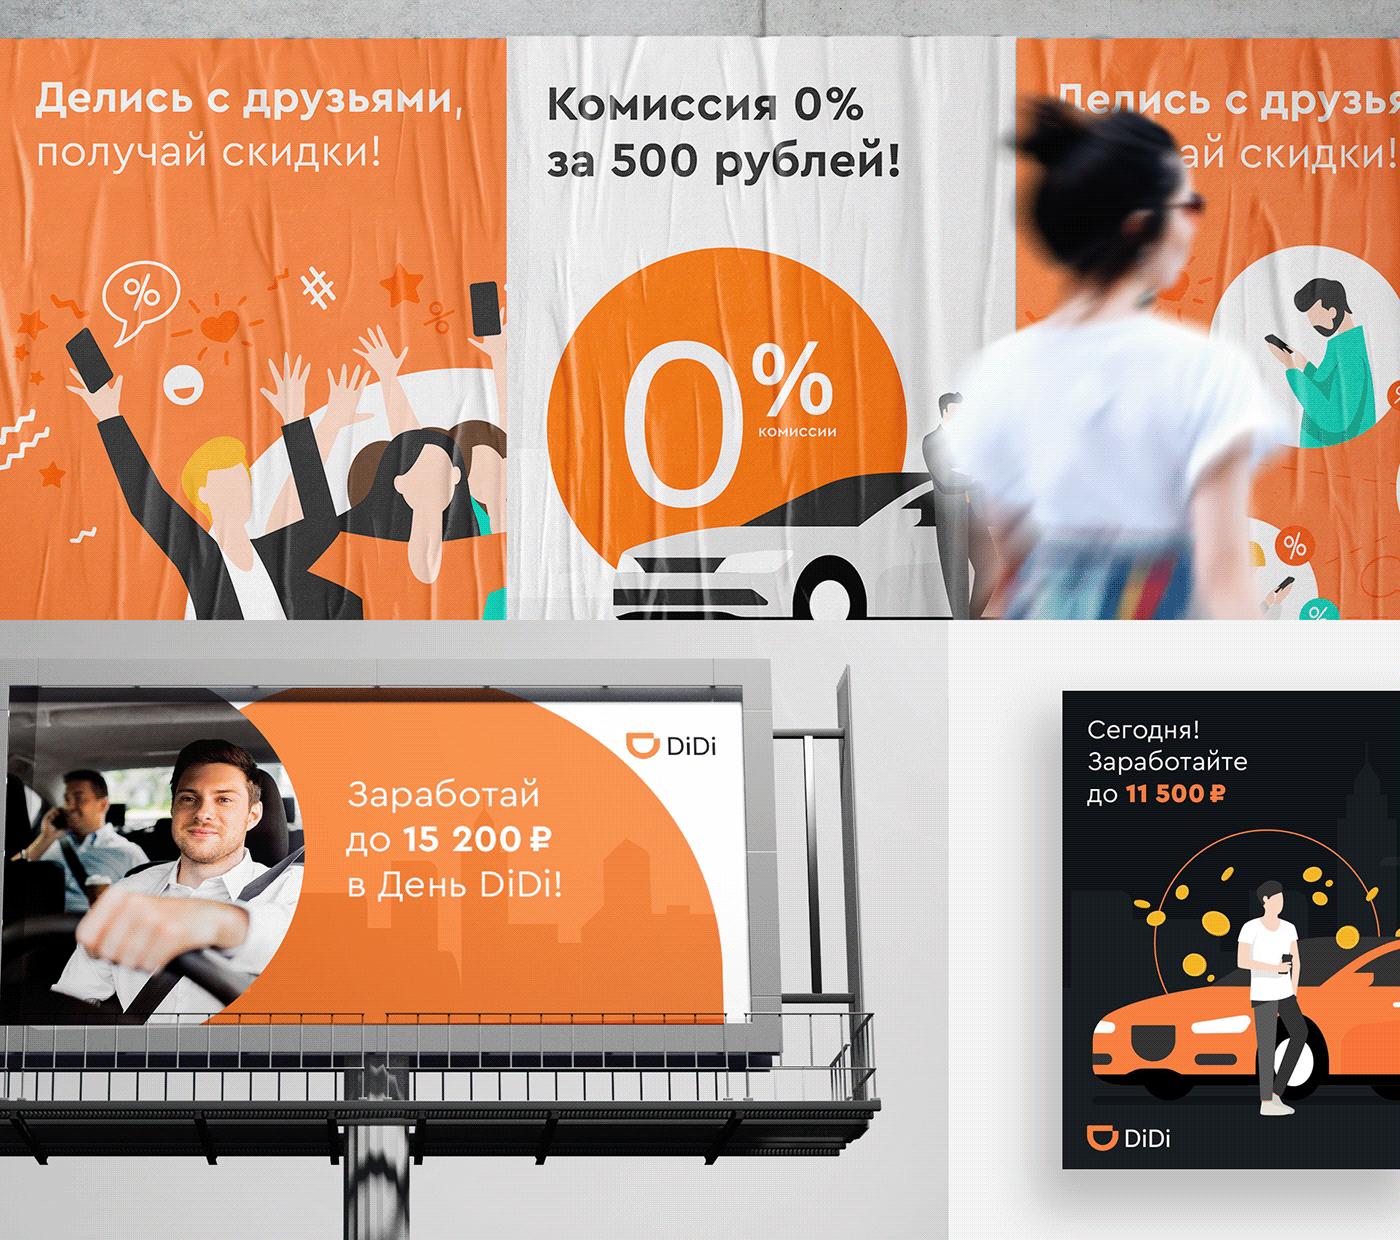 ad banners Cars orange poligraphy social media taxi Transport полиграфия такси